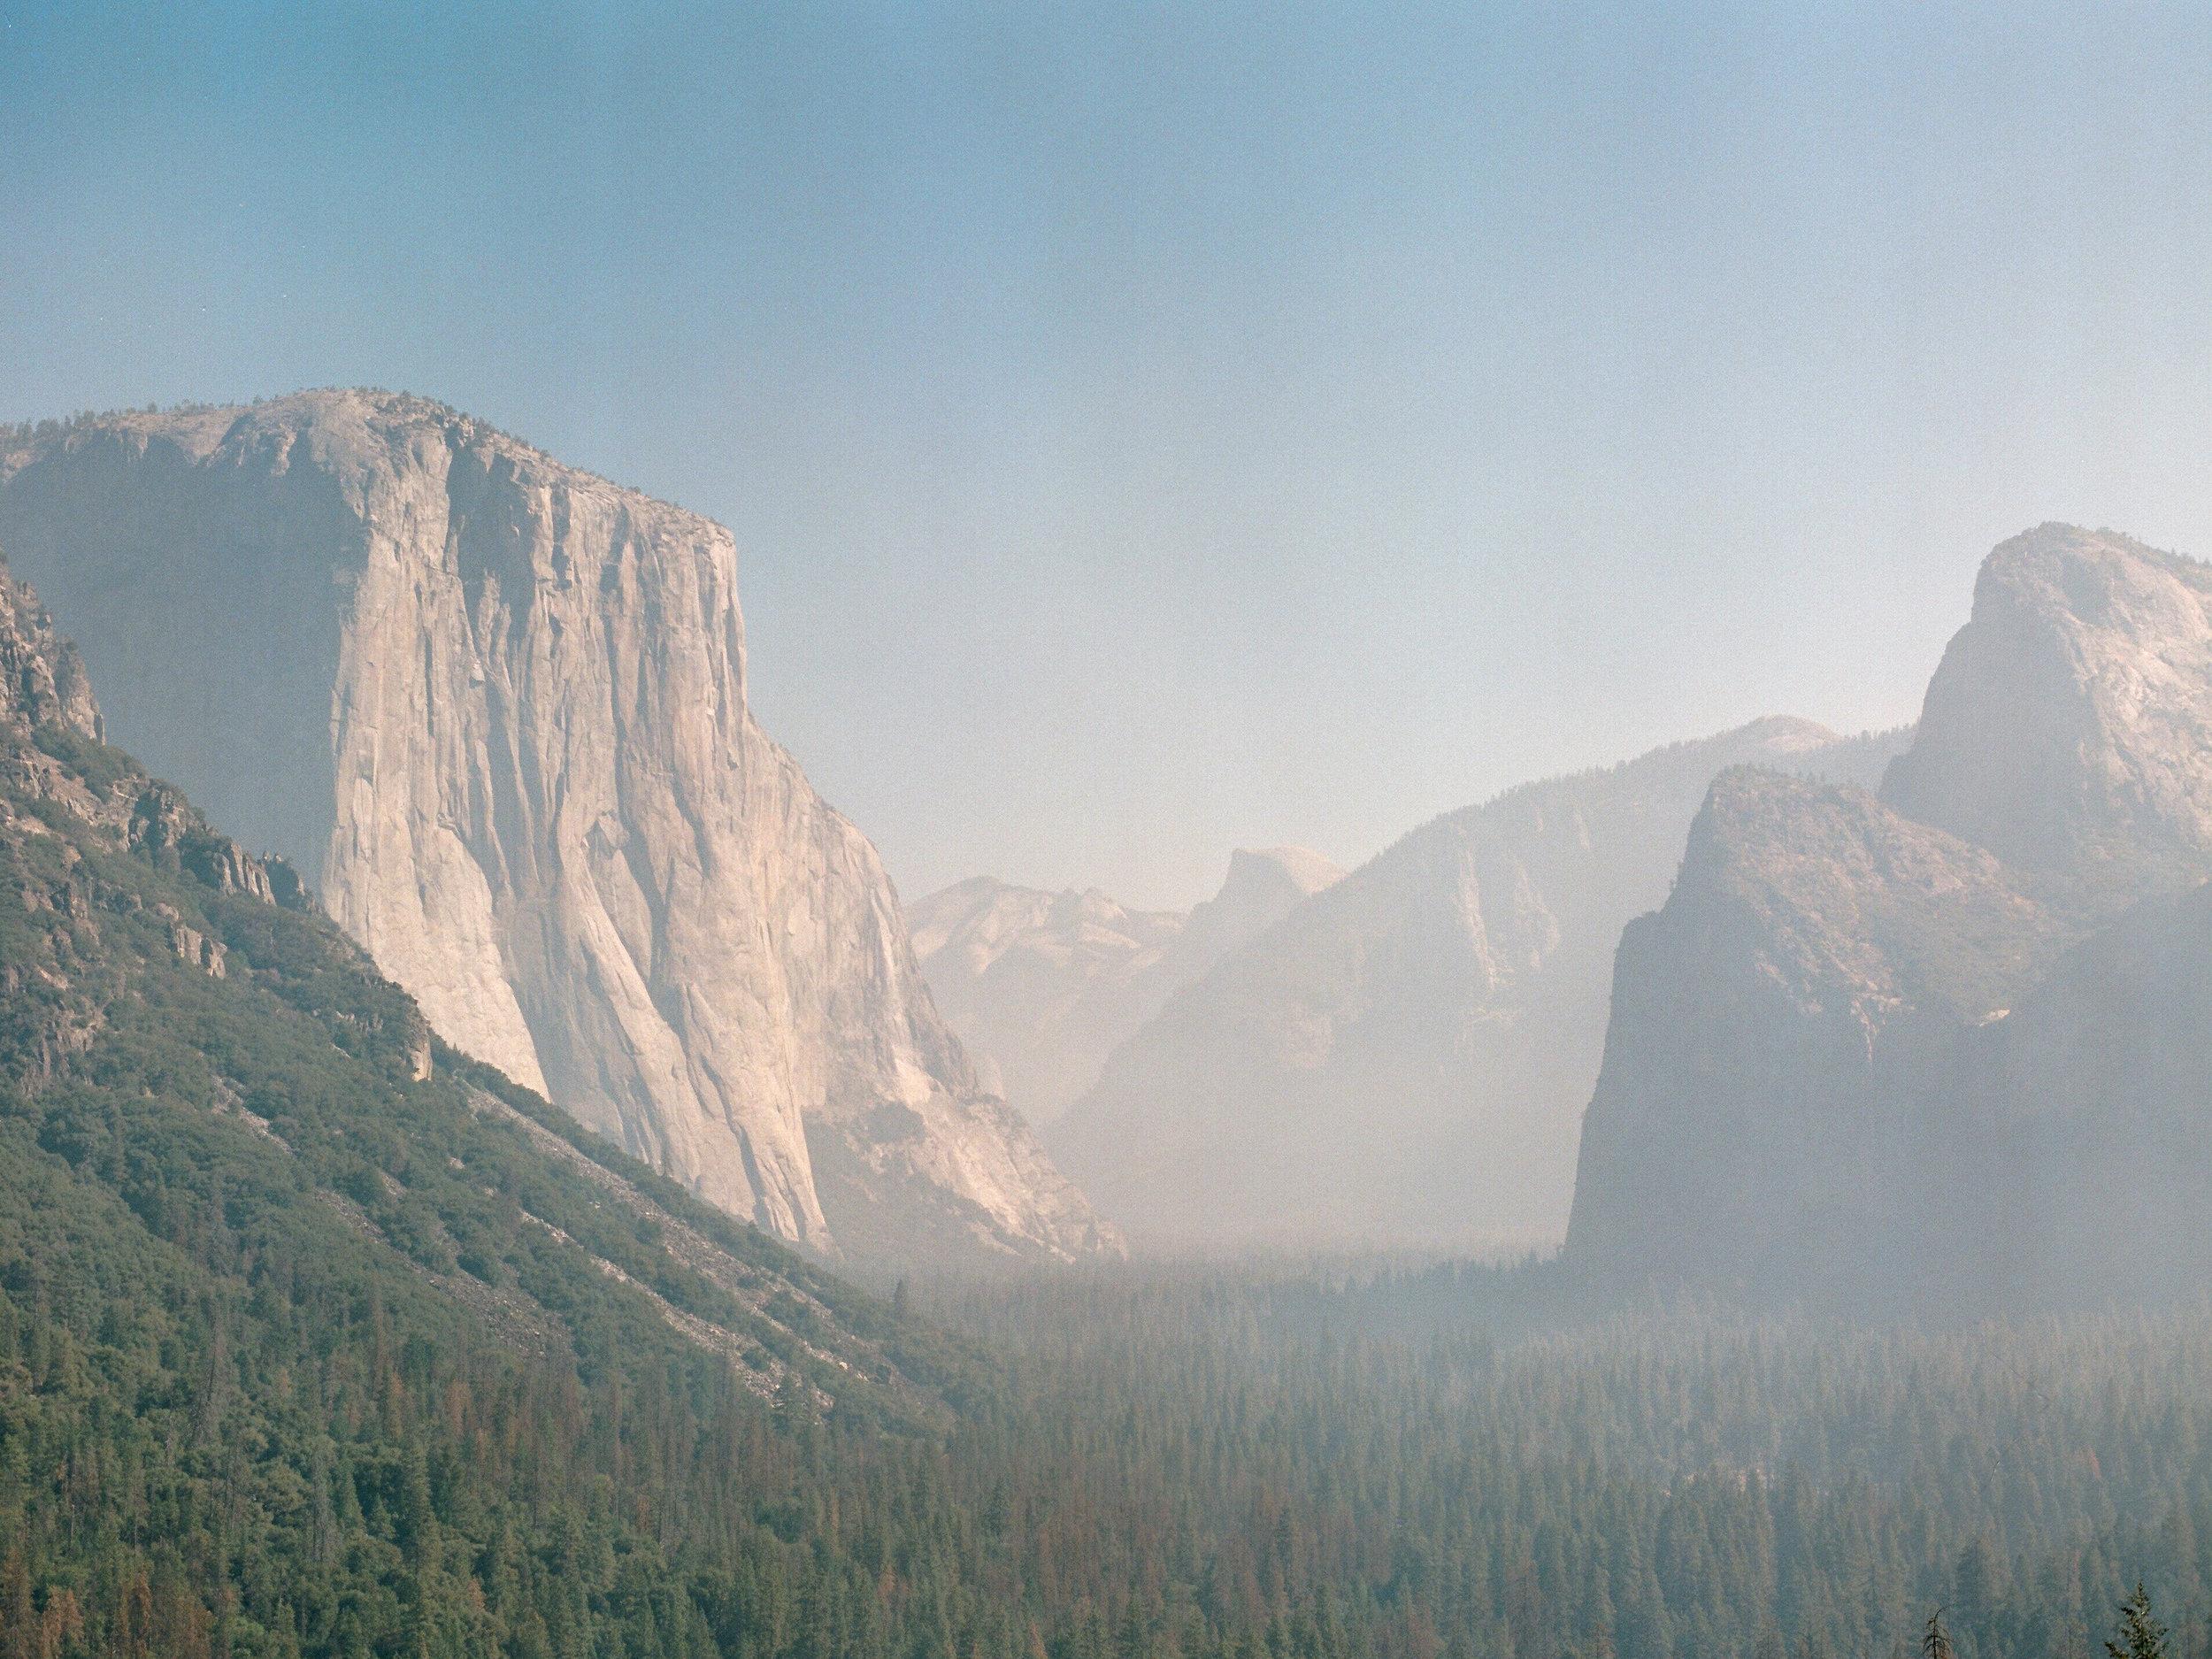 Yosemite_Wedding_Photographer_Travel_California_Rhianna_Mercier_